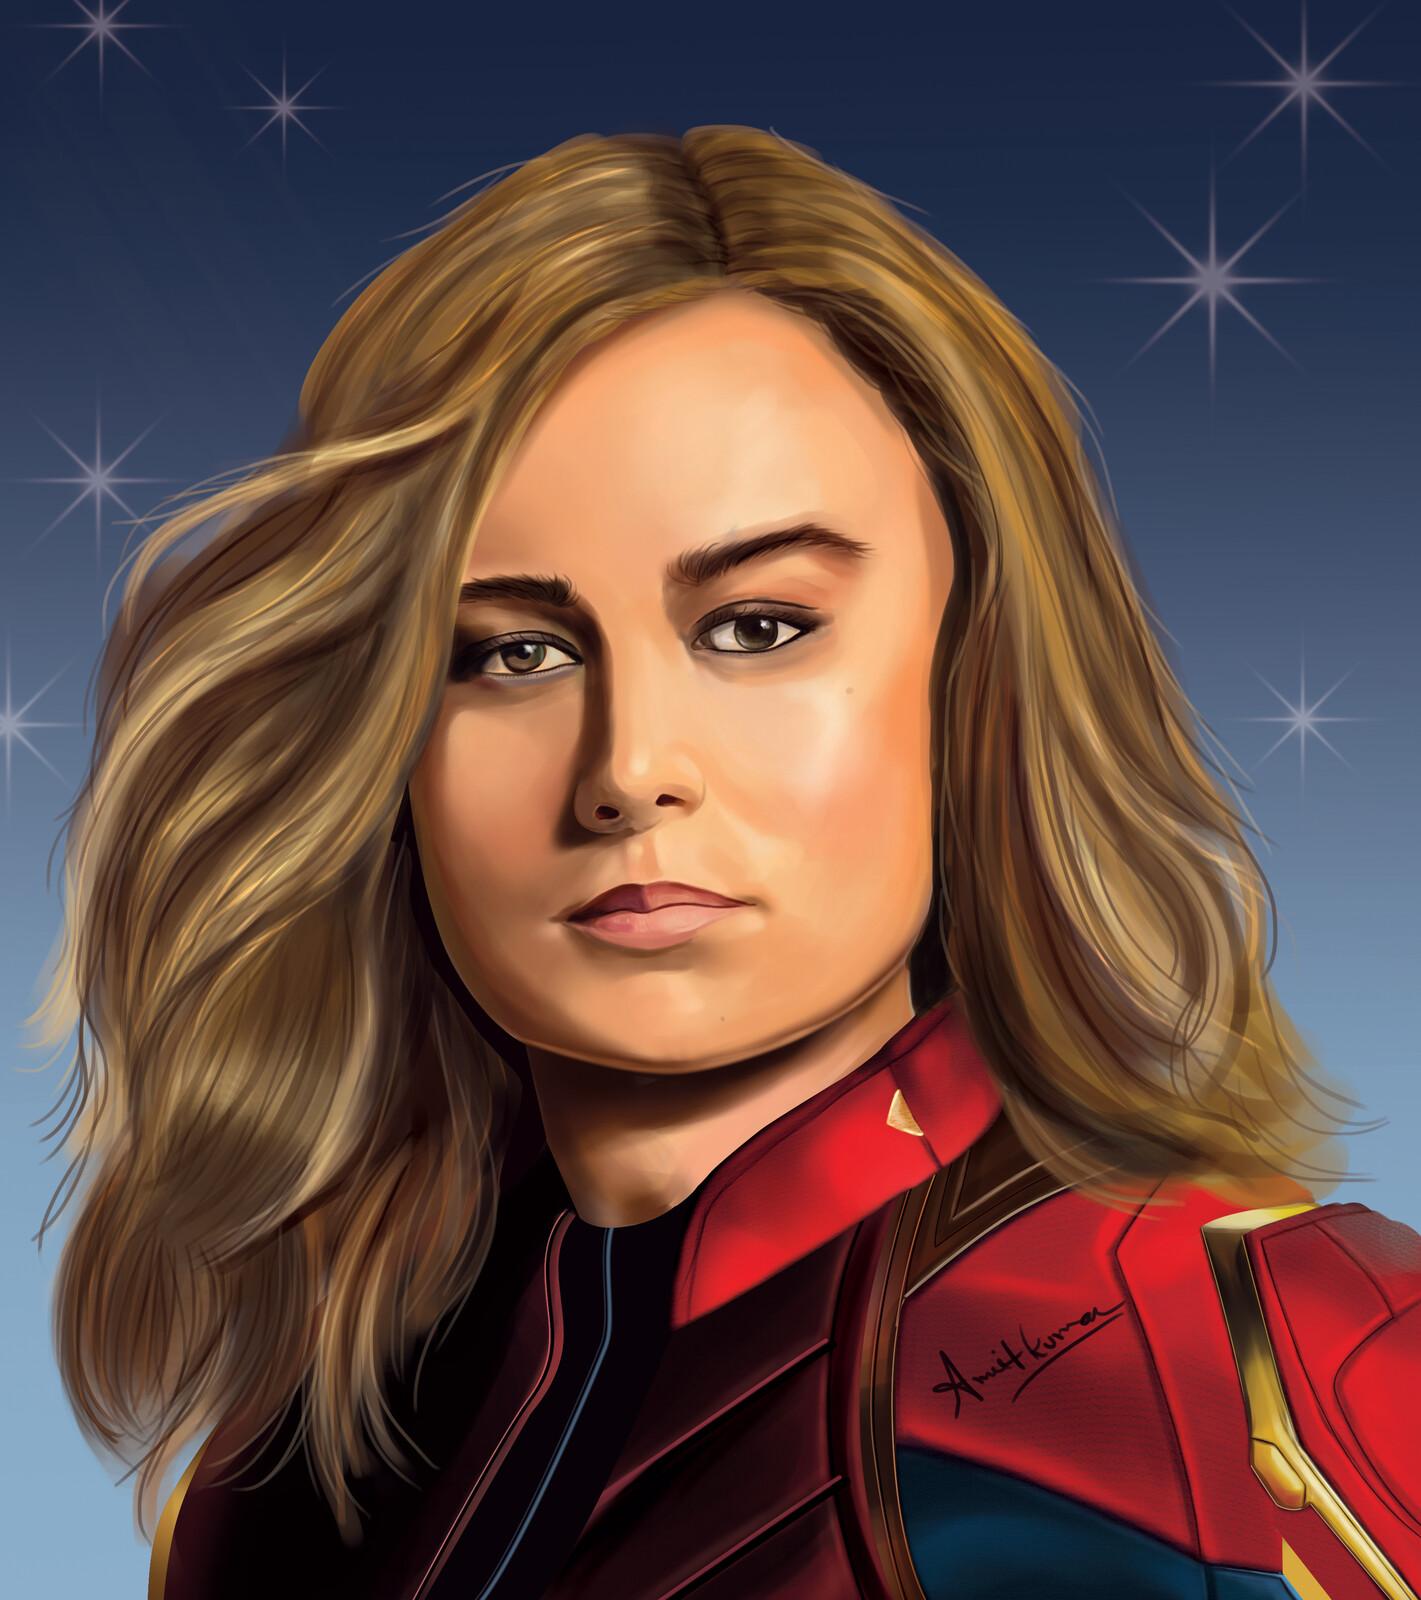 Captain marvel digital painting